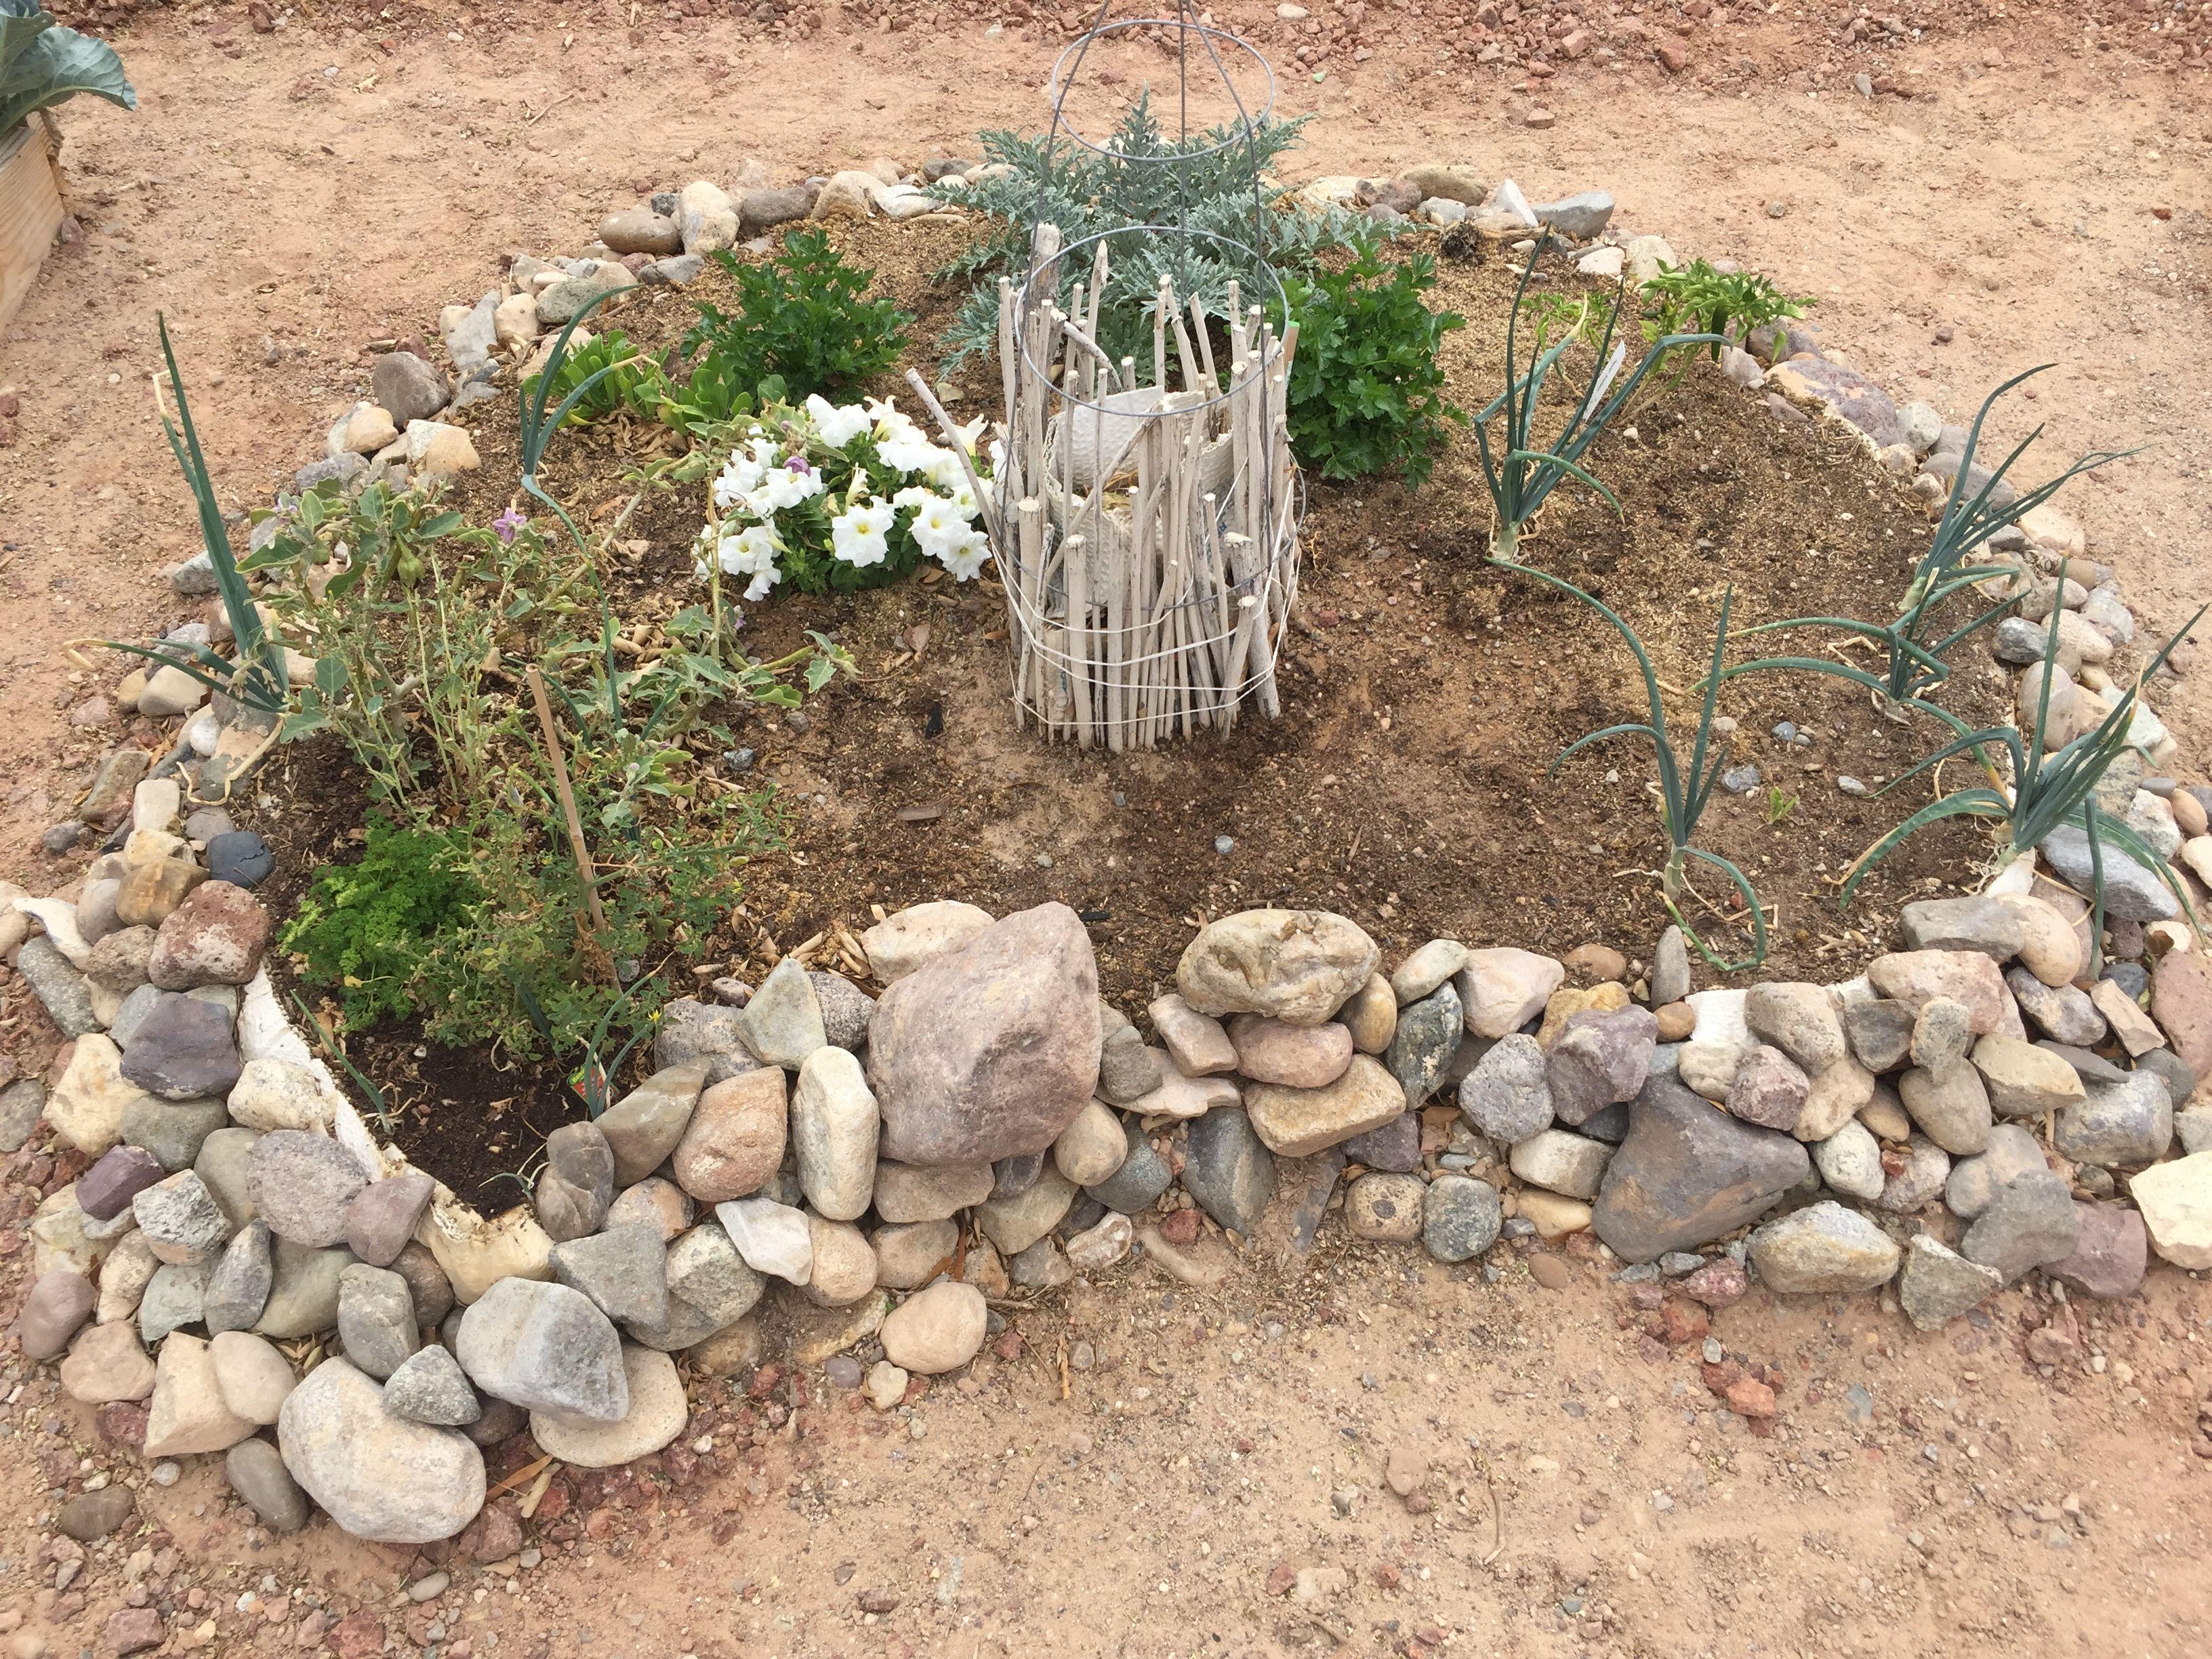 Keyhole garden | East of Mojave | Pinterest